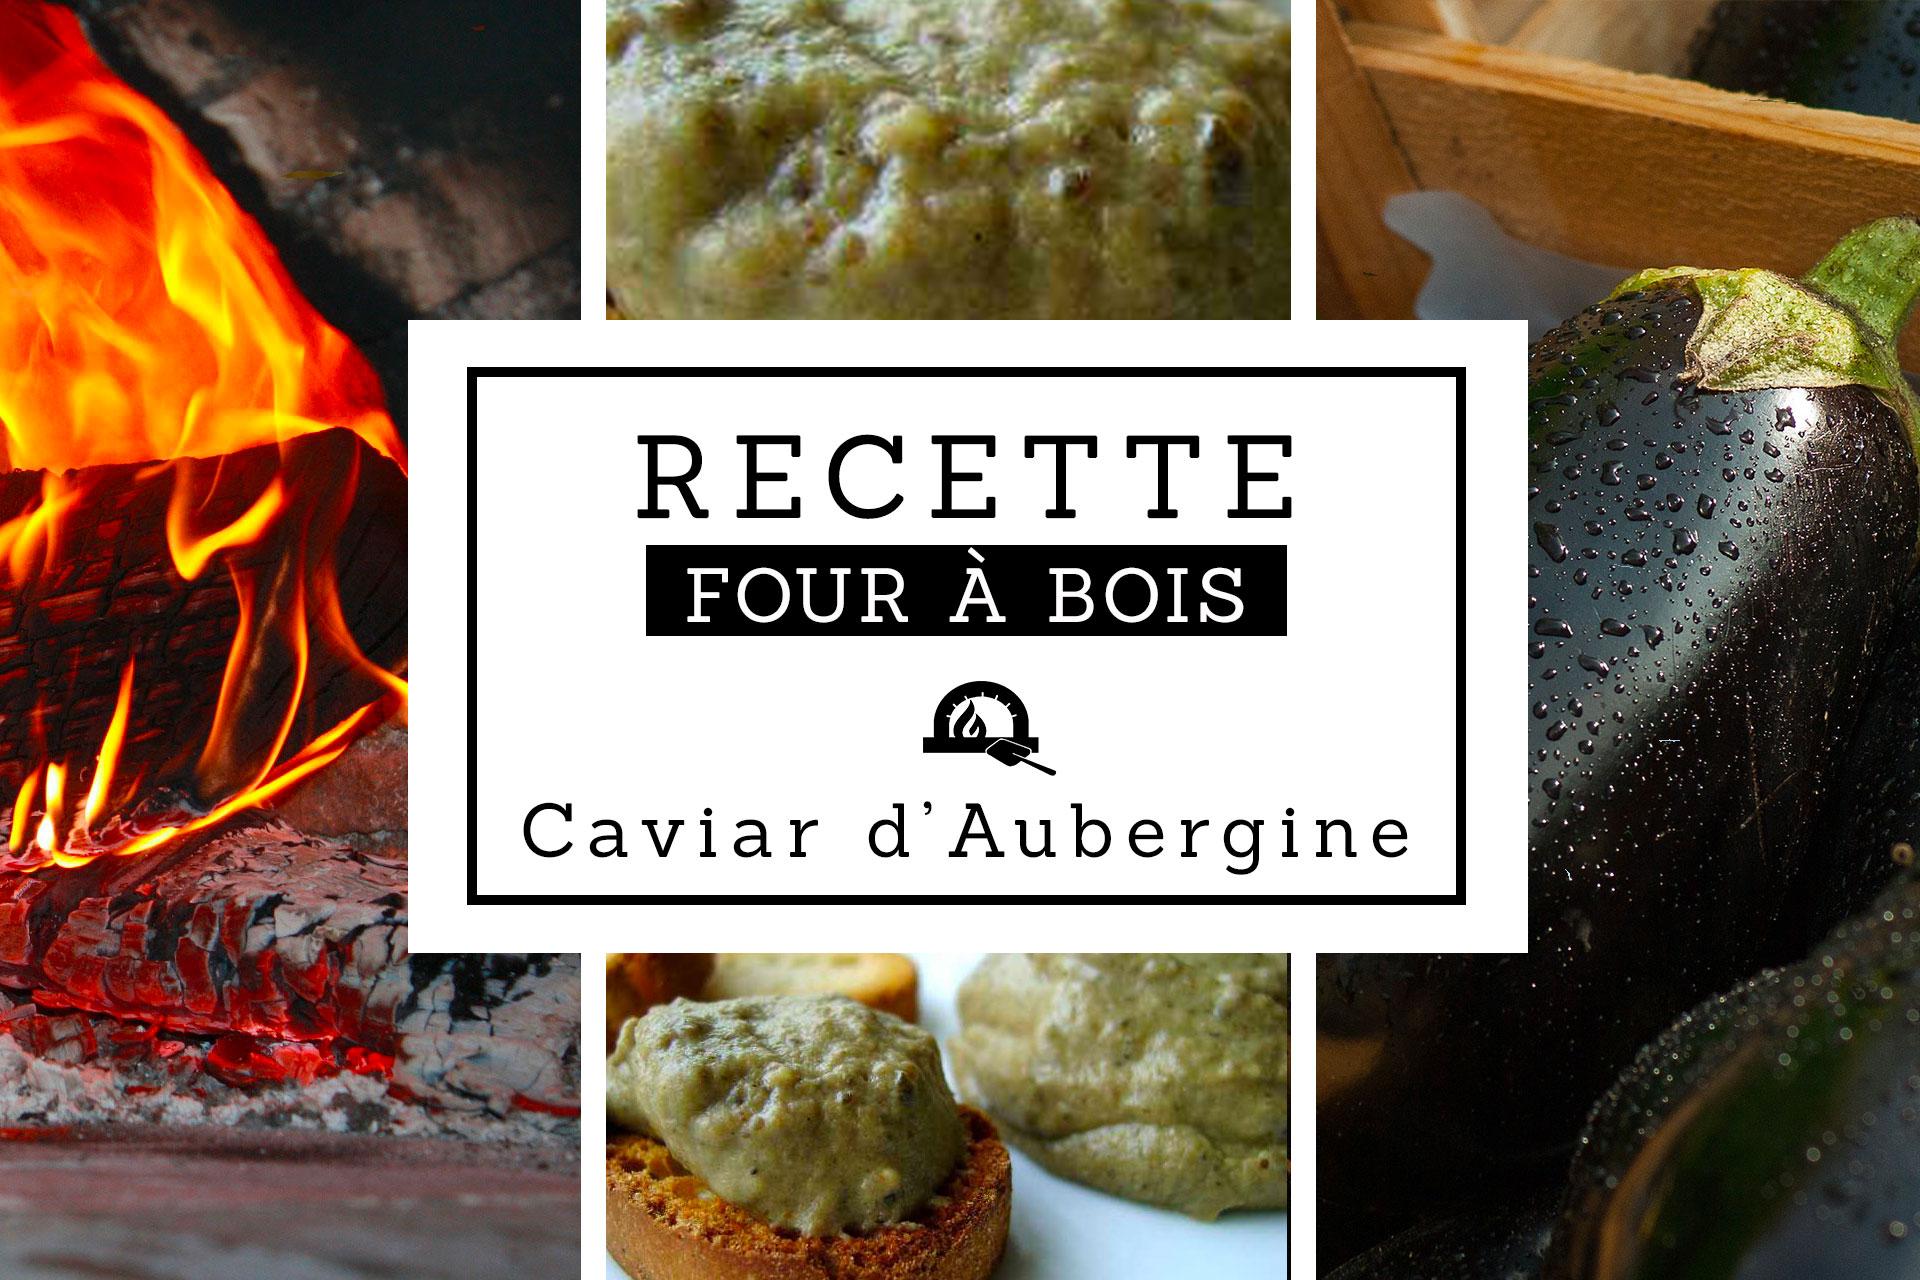 affiche-recette-caviar-aubergine